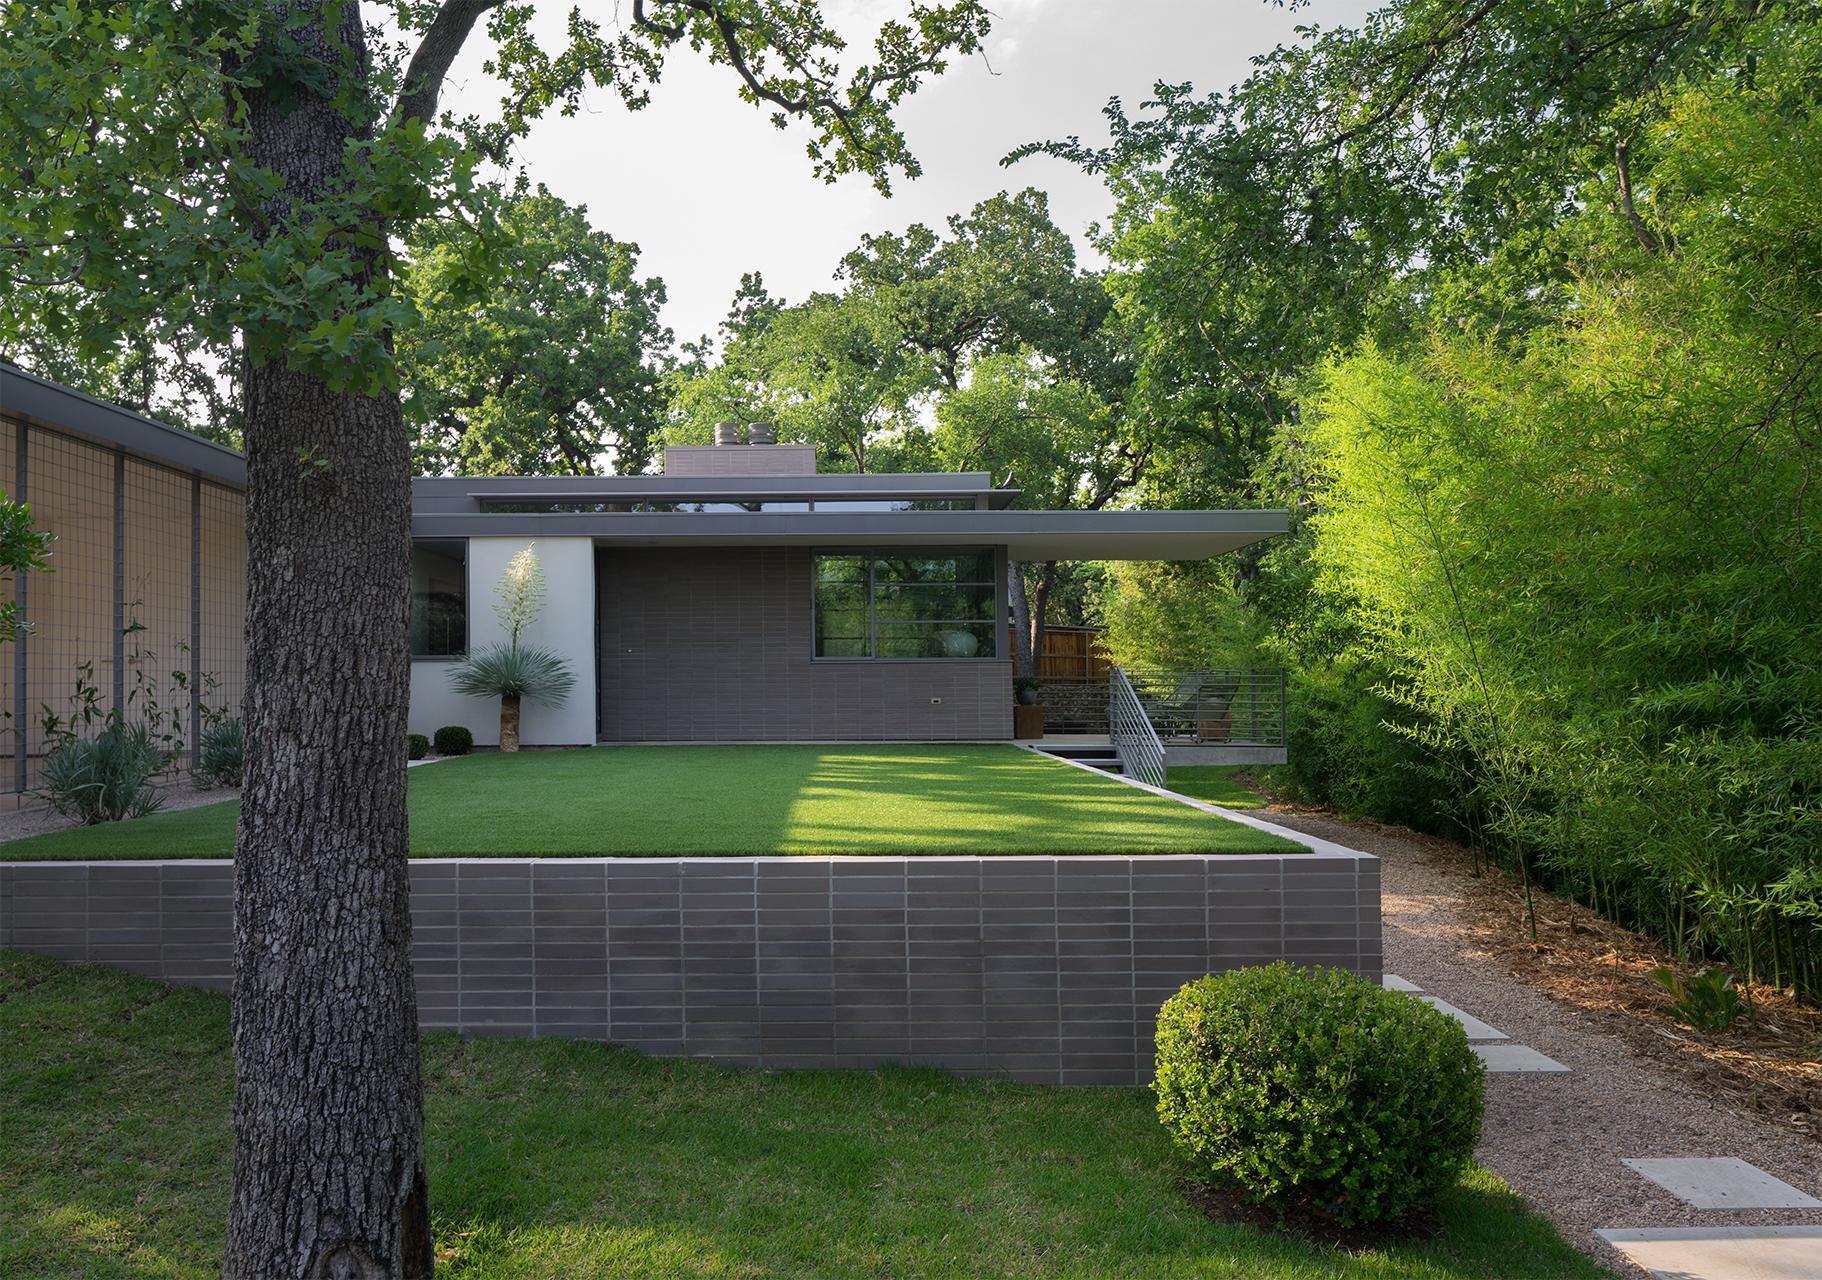 Blanke_Exterior-Entry-Lawn.jpg